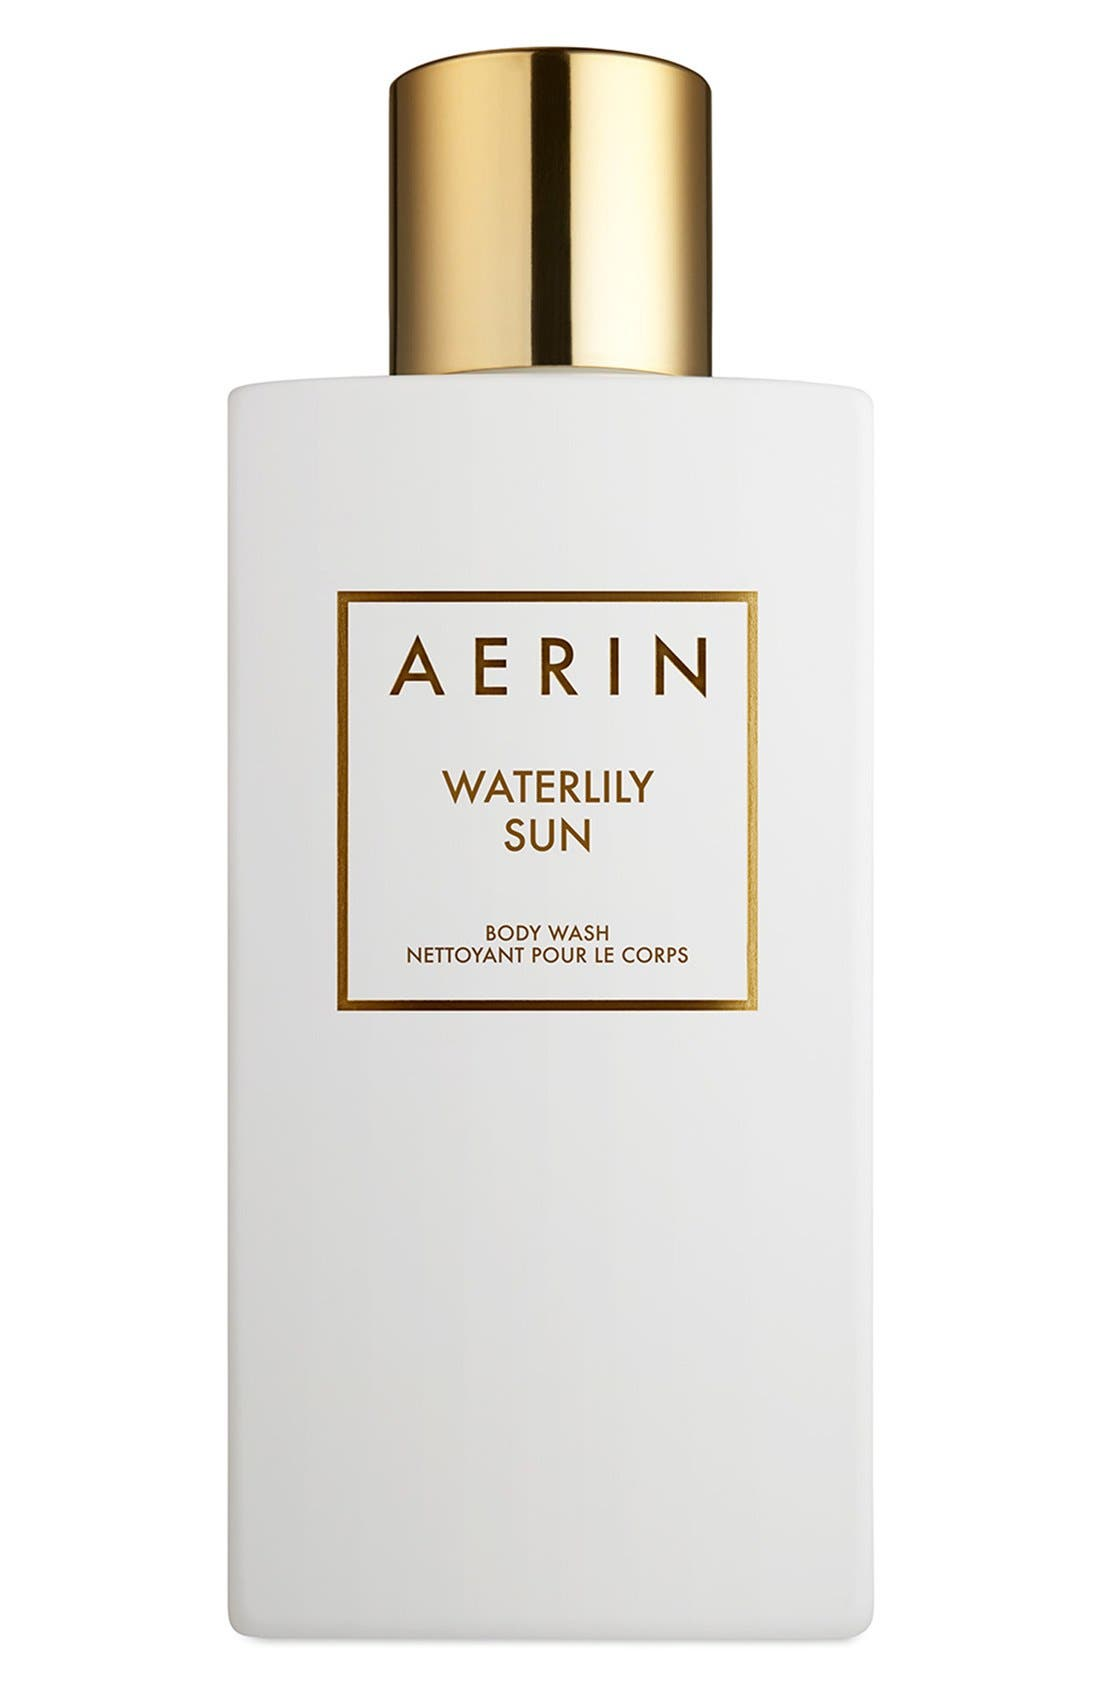 AERIN Beauty Waterlily Sun Body Wash